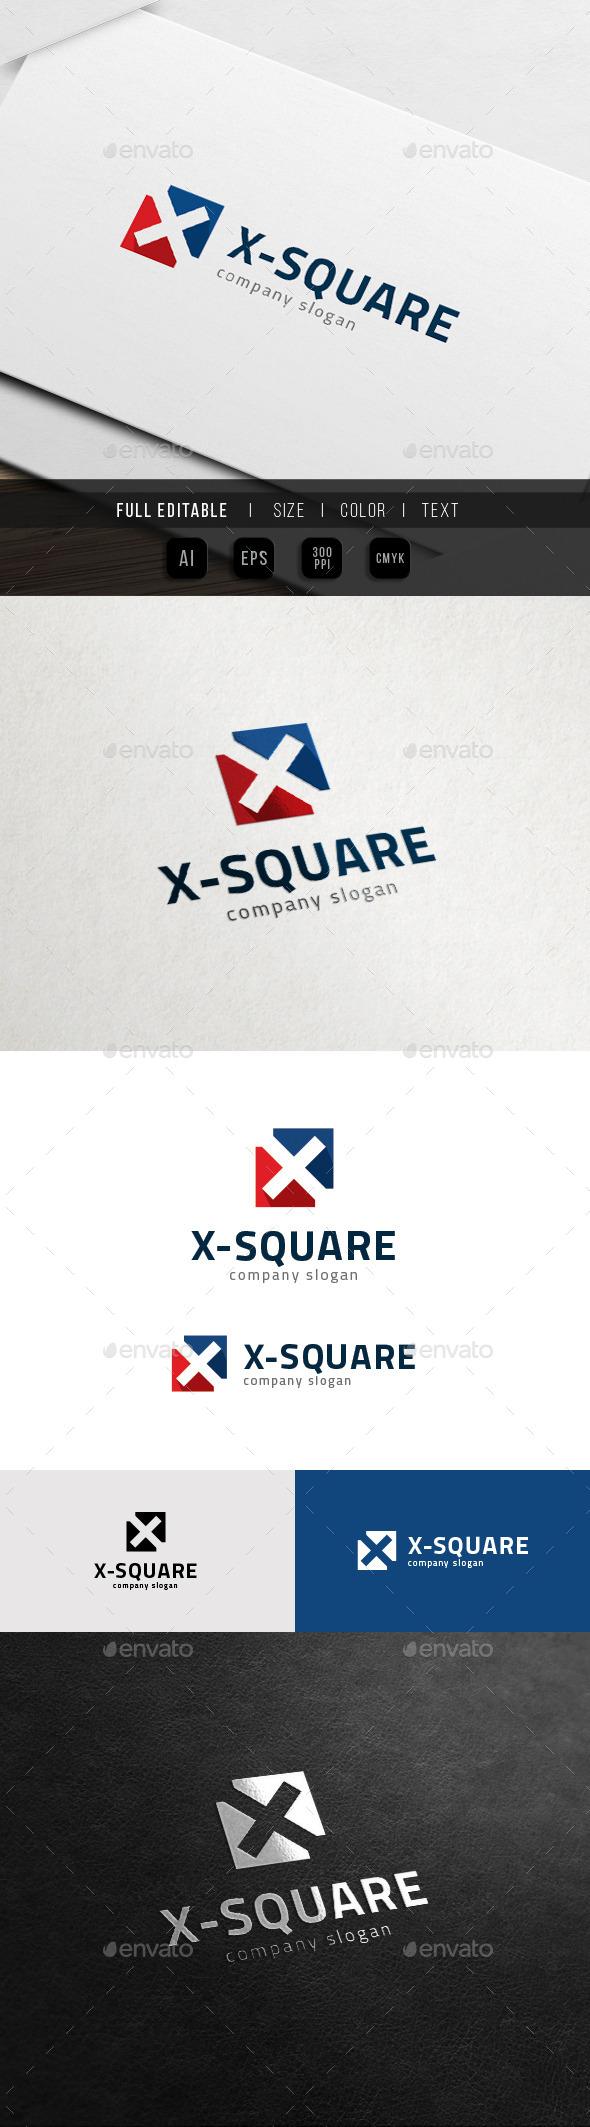 X Logo - Square Cross Sport